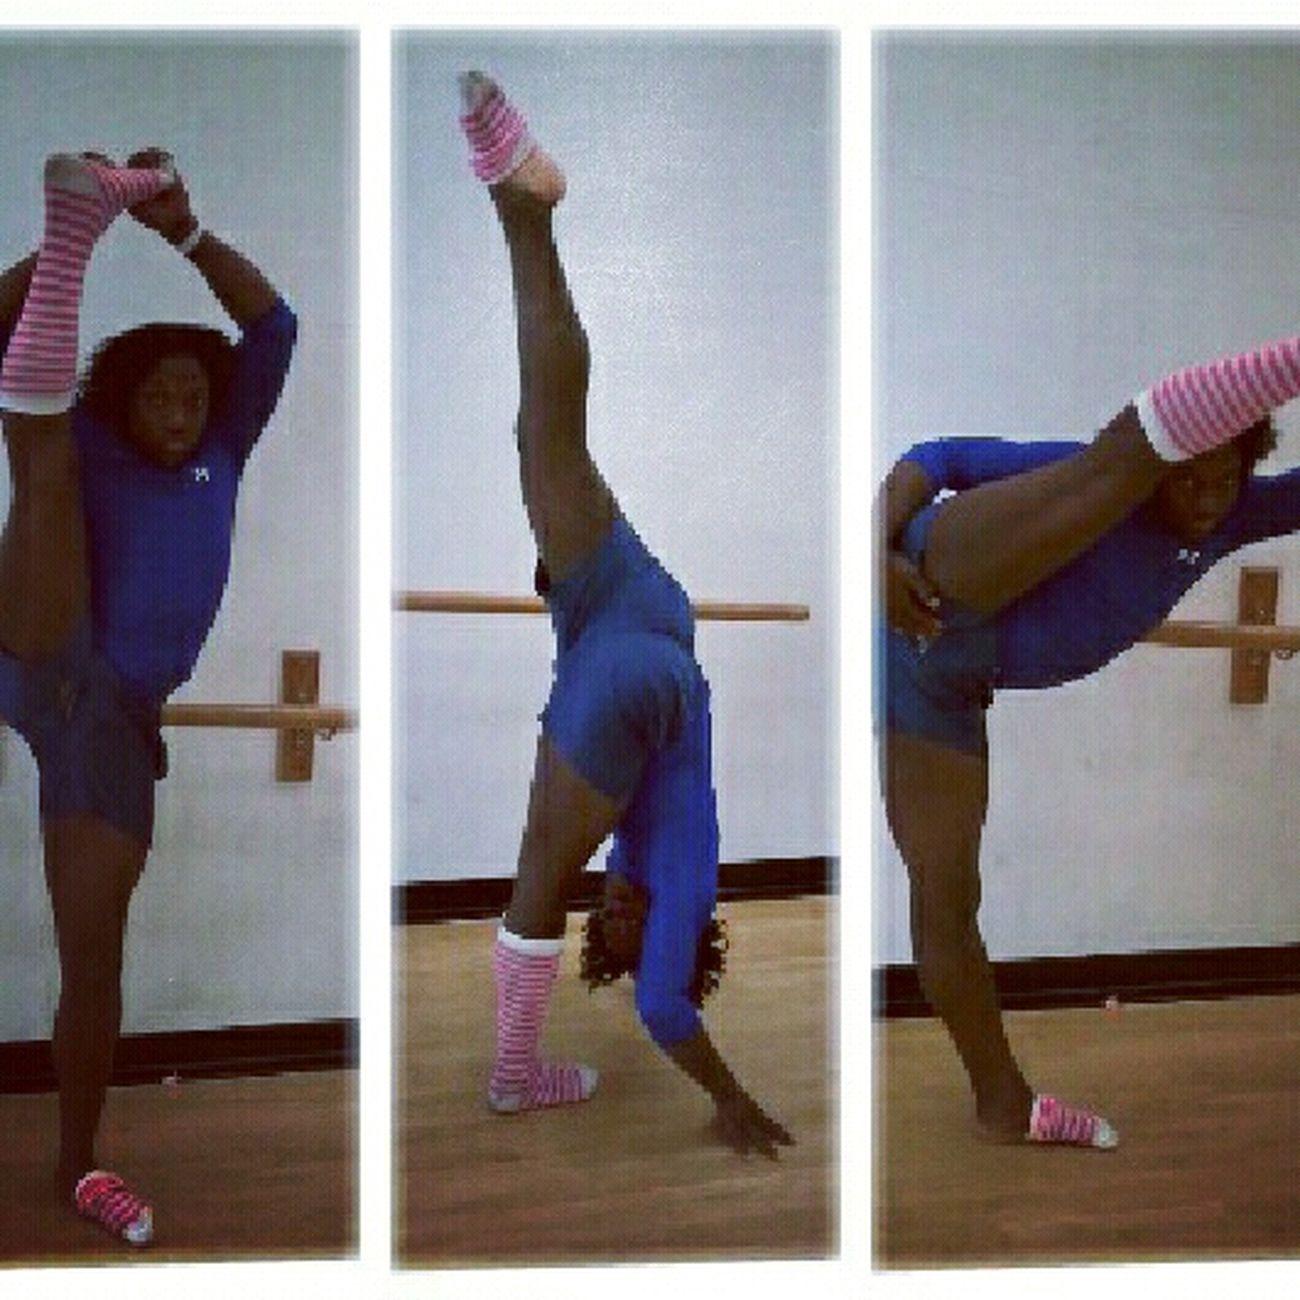 Flexing !